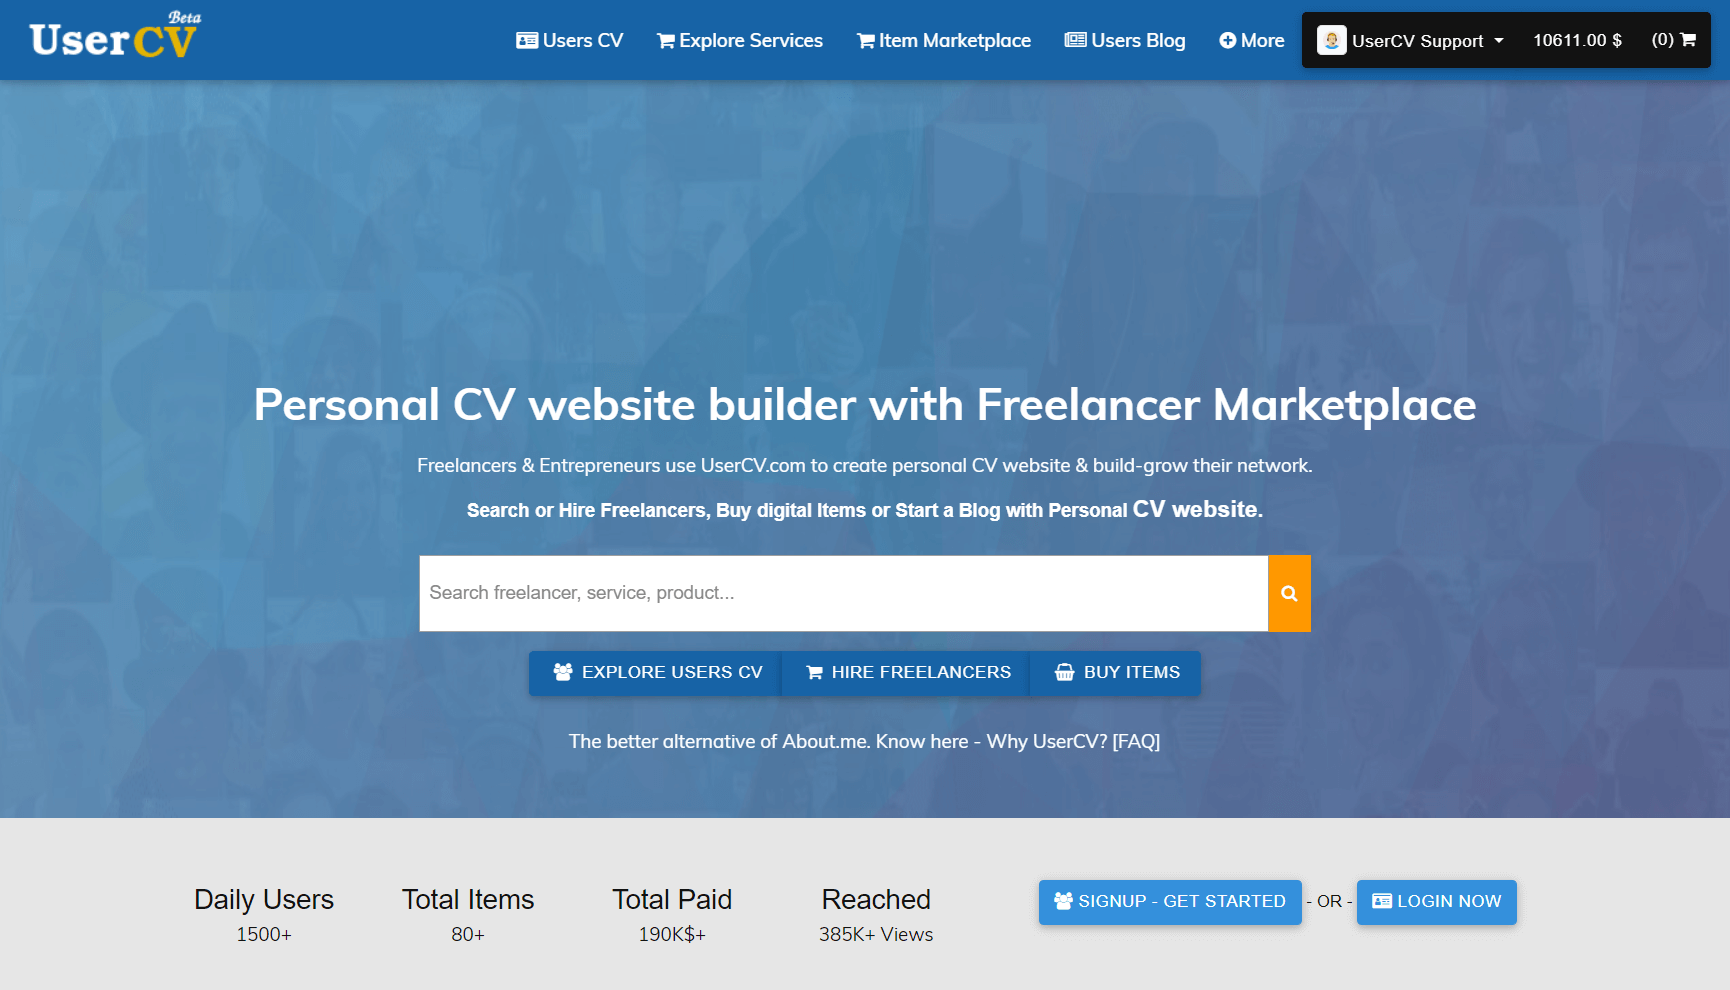 FreelancerCV - Fiverr Clone - Envato Clone - Tumblr Clone - About.me Clone (Multi Domain SAAS) - Home Page